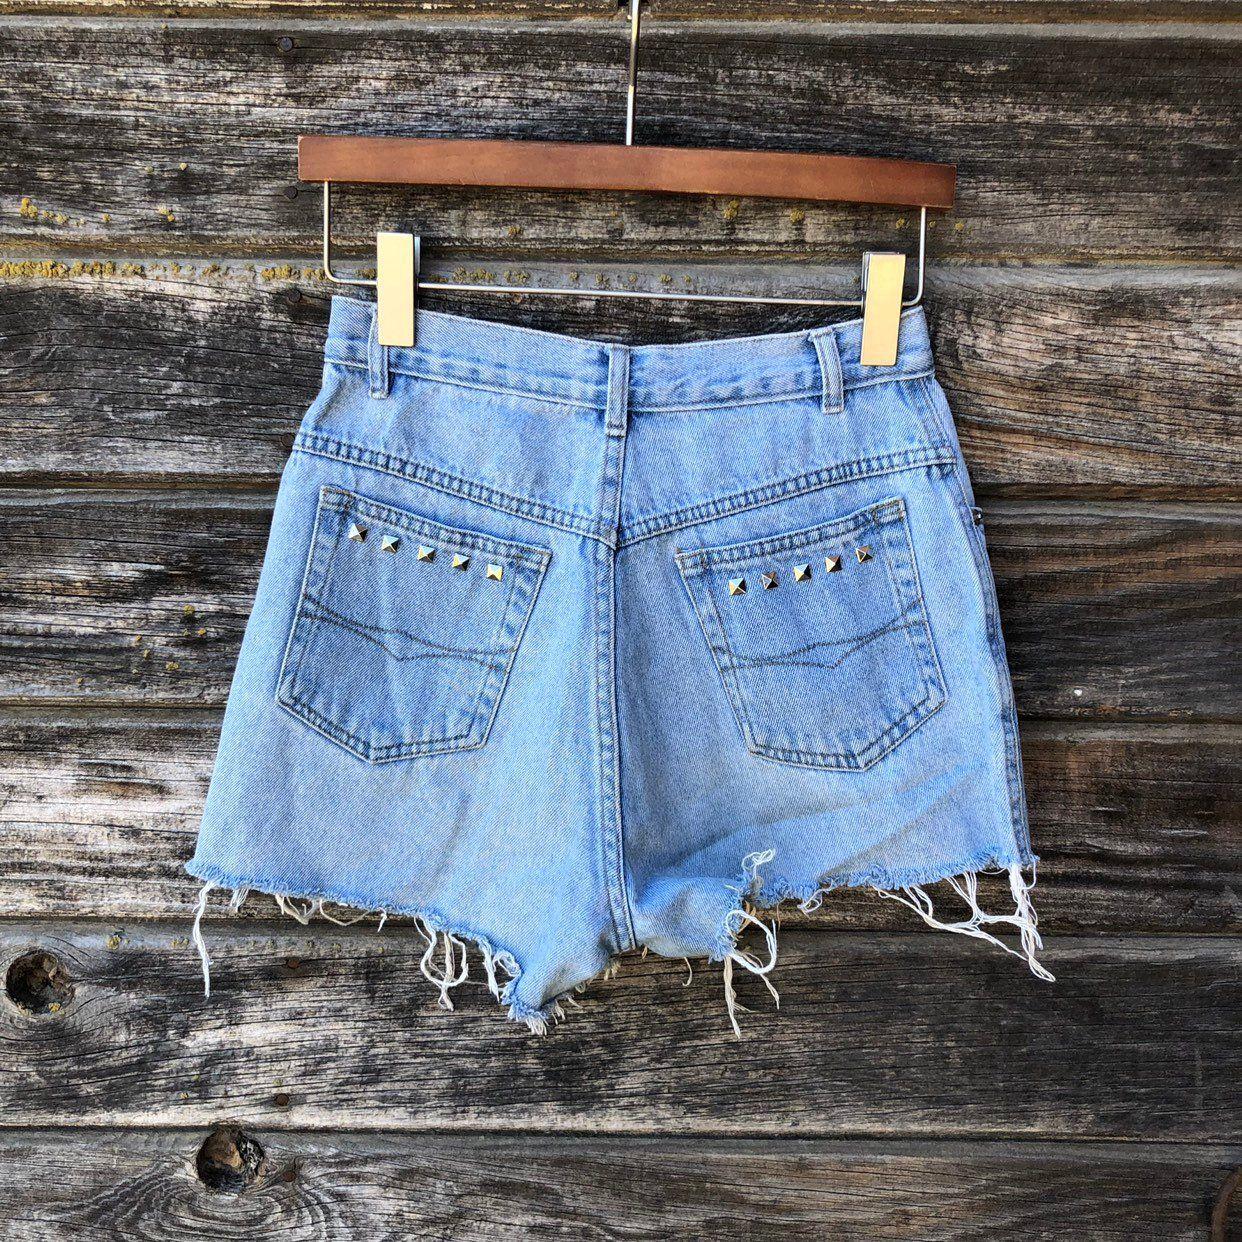 39312cf33149 Vintage Bugle Boy denim shorts cut-off jean shorts waist 25 90s grunge  distressed frayed